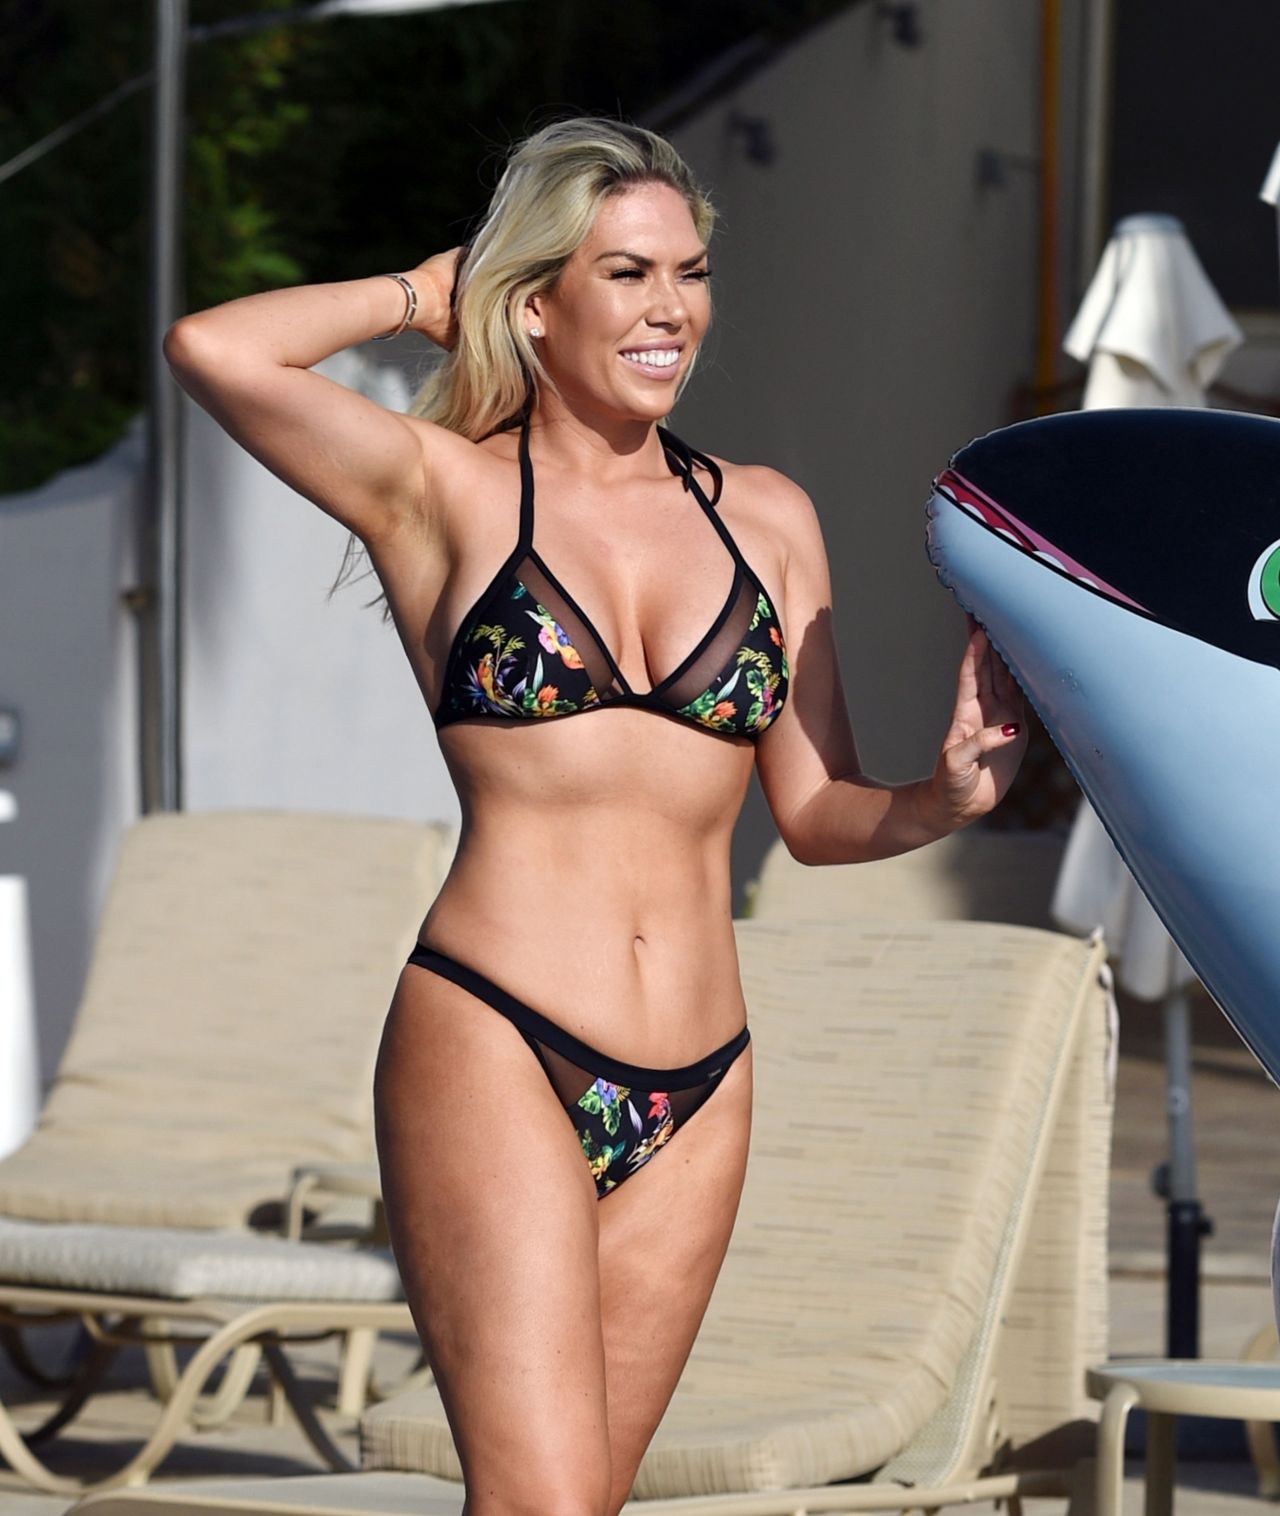 Frankie Essex In Bikini Holiday In Portugal 02 20 2018